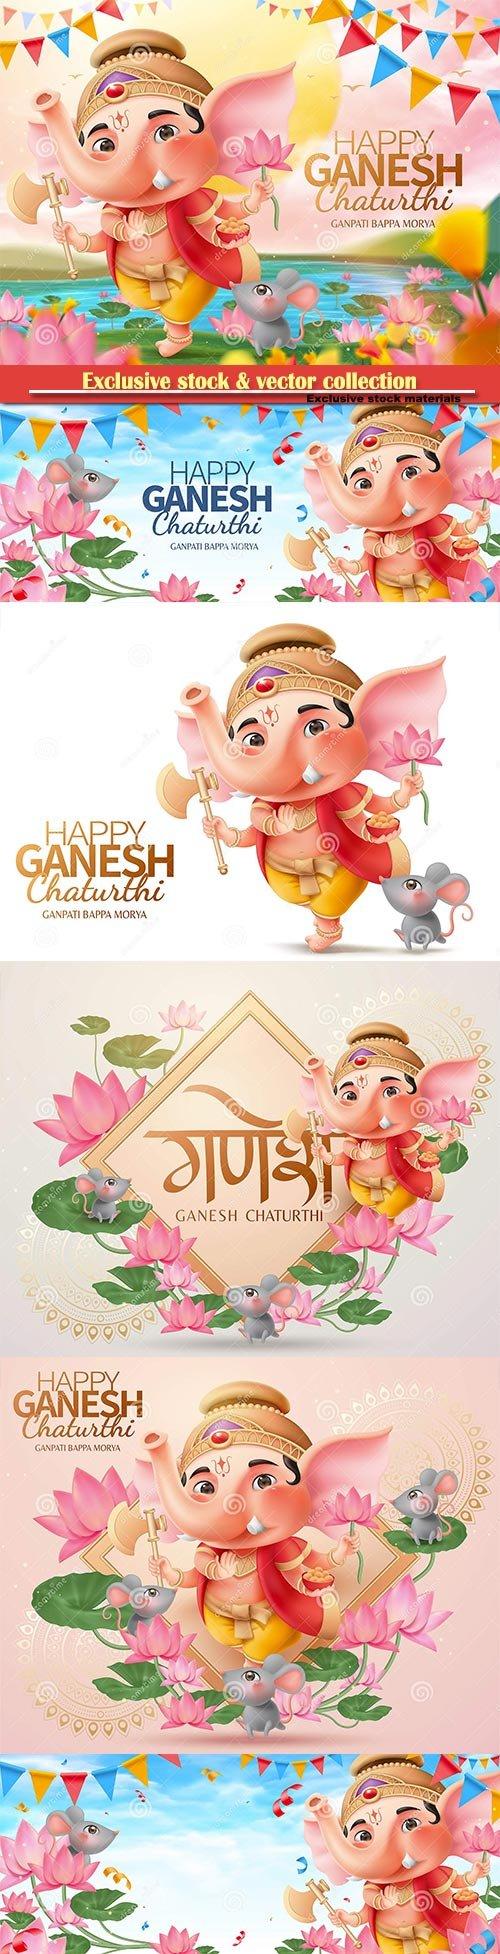 Happy Ganesh chaturthi vector design